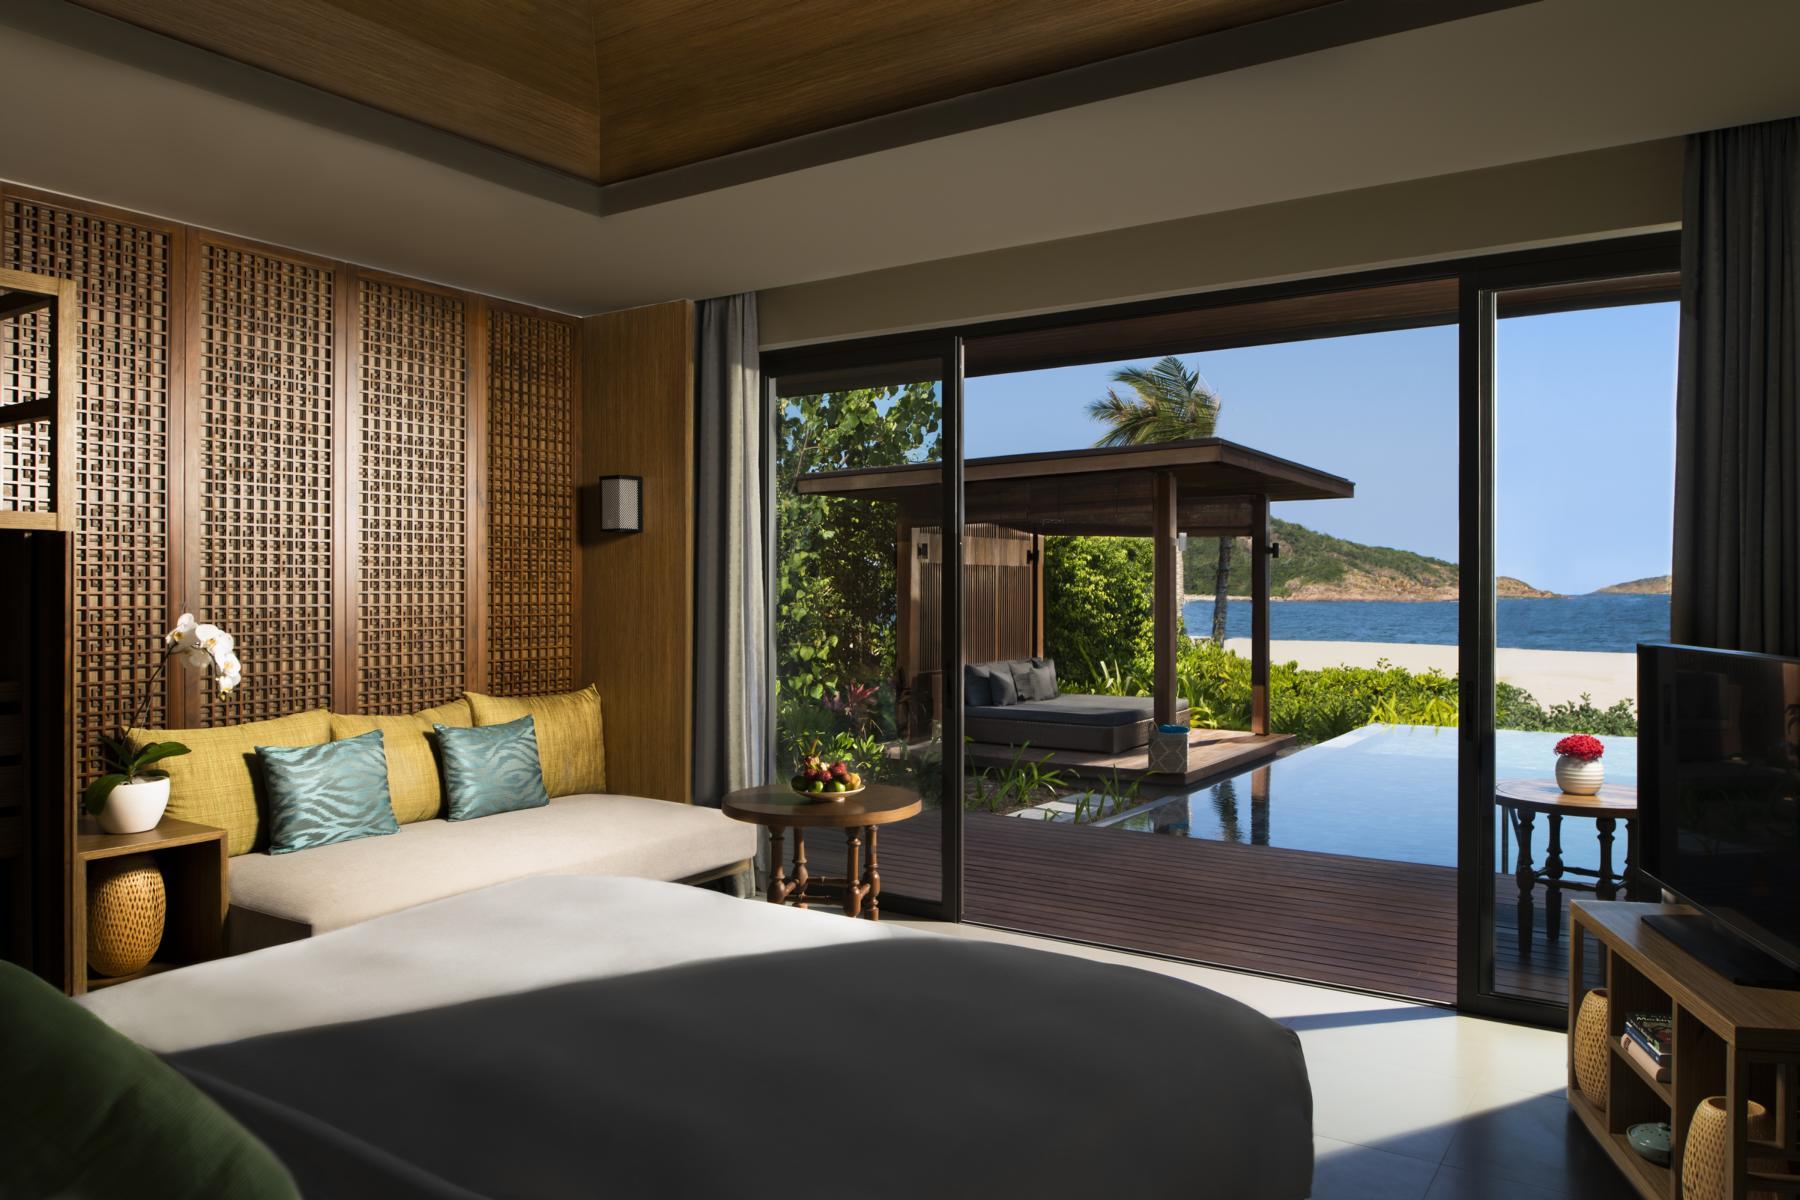 One Bedroom Beach Pool Villa in den Anantara Villas Quy Nhon in Vietnam